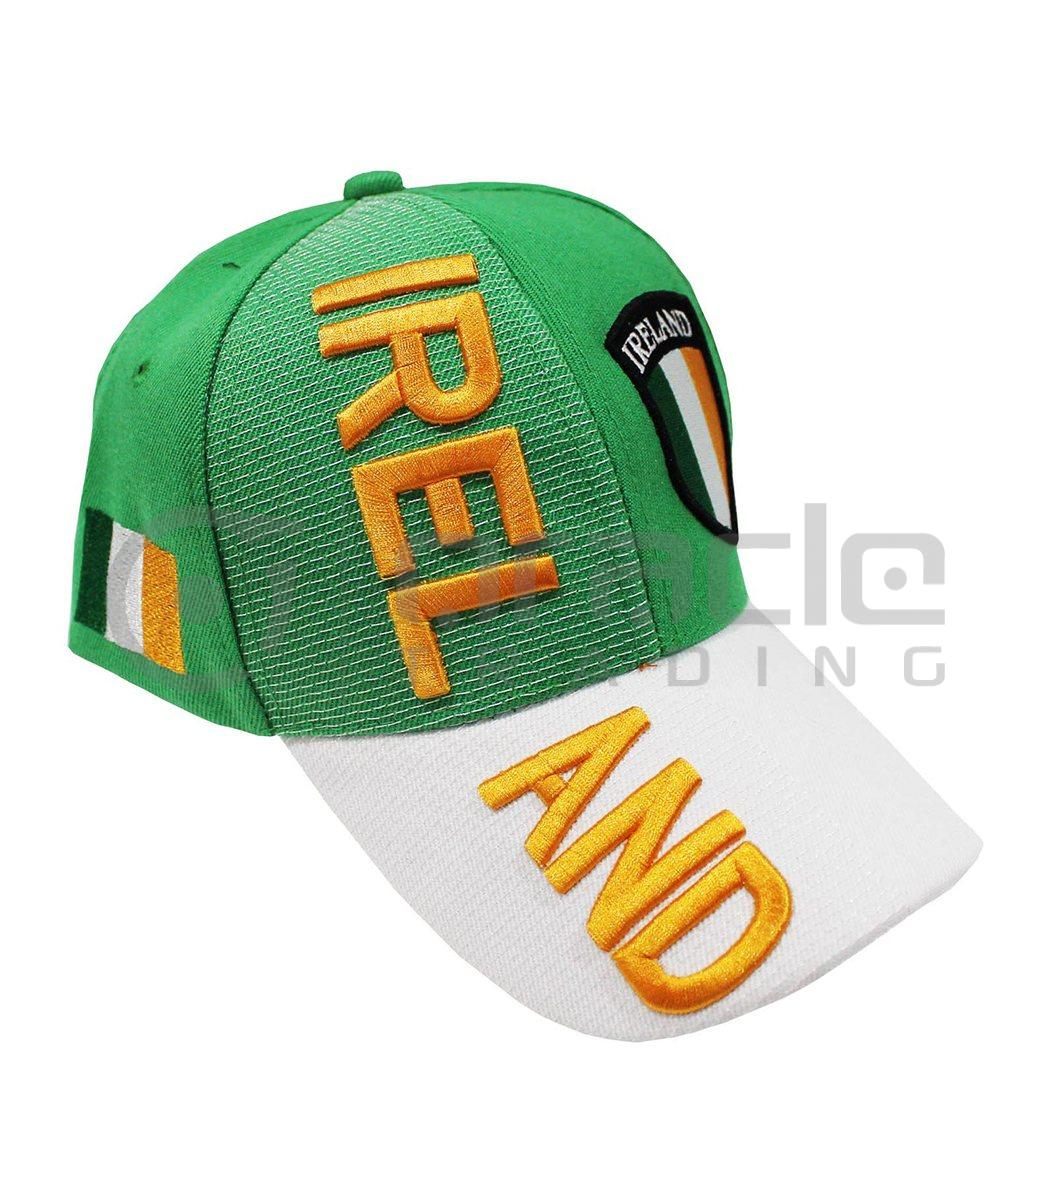 3D Ireland Hat - Shield